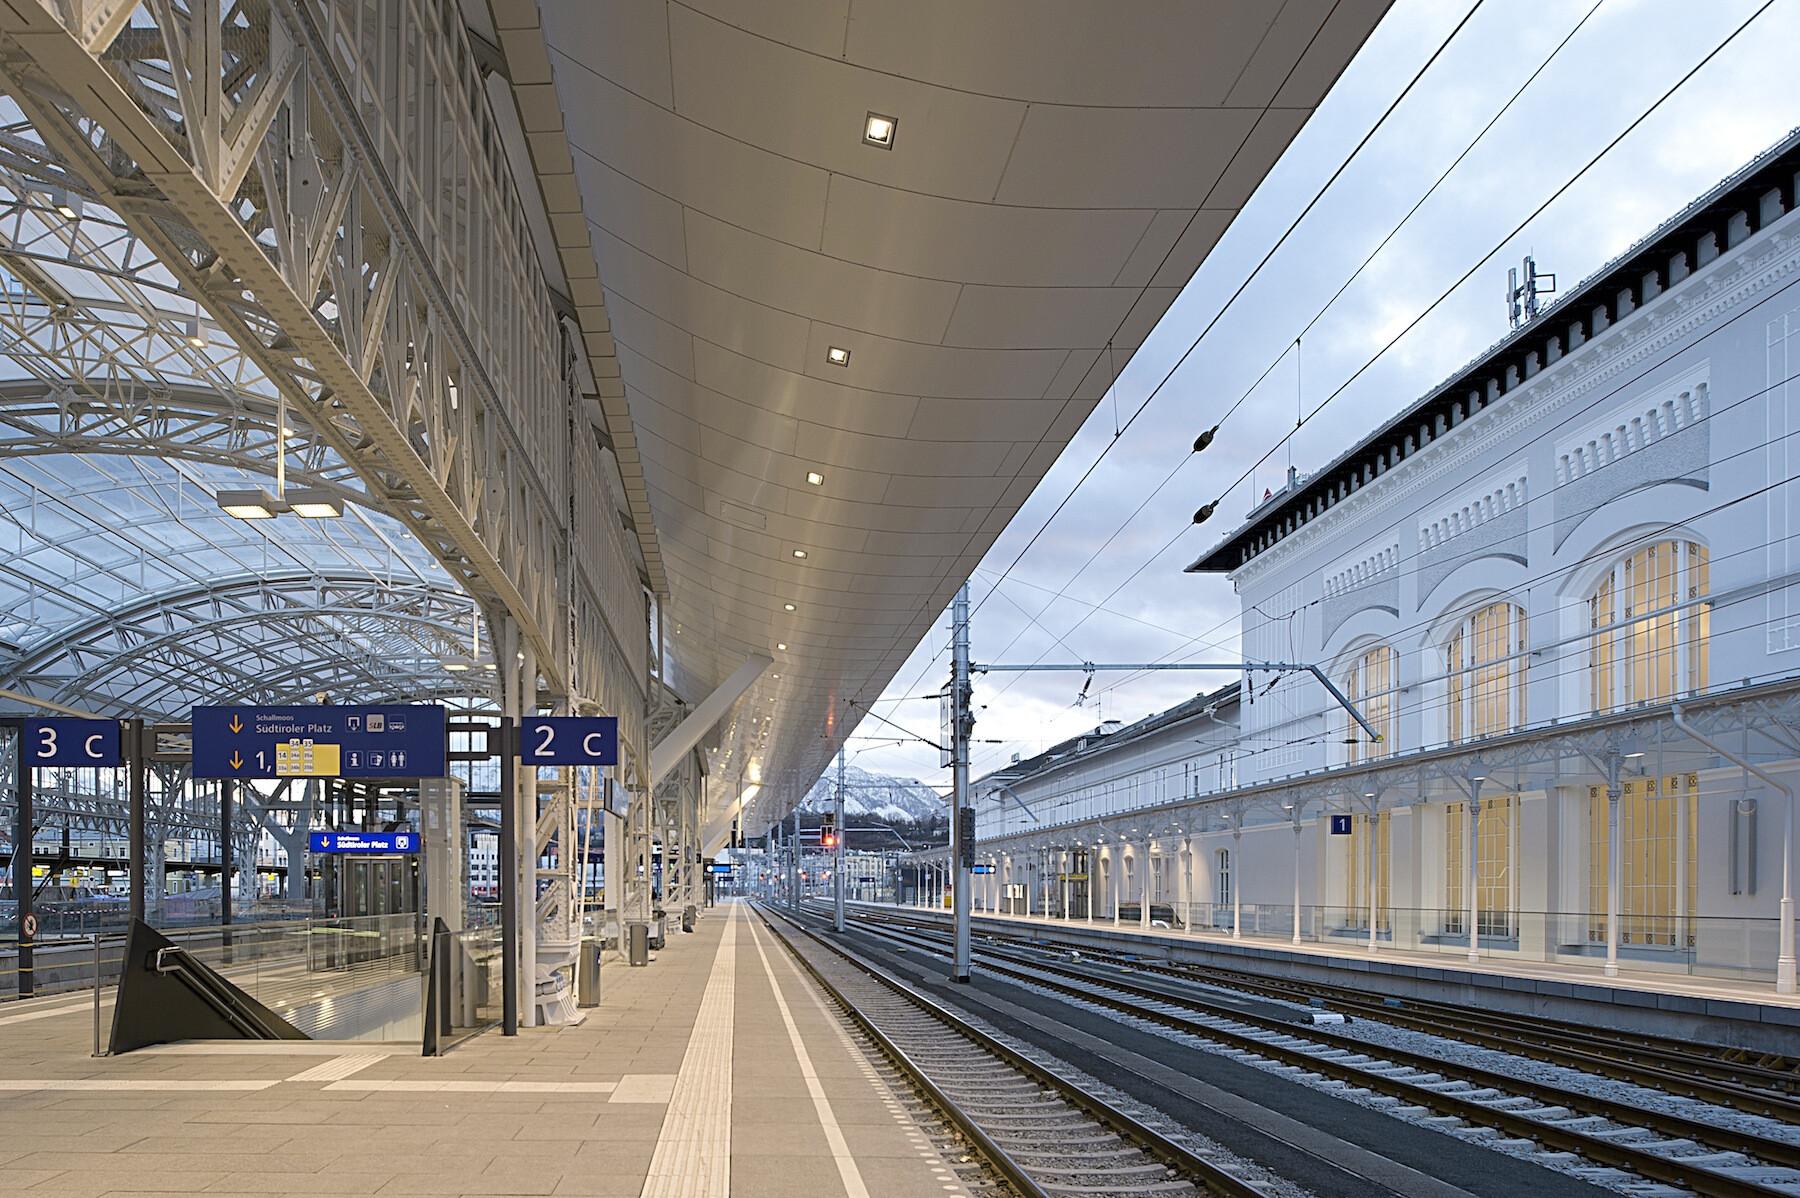 Salzburg Central Train Station